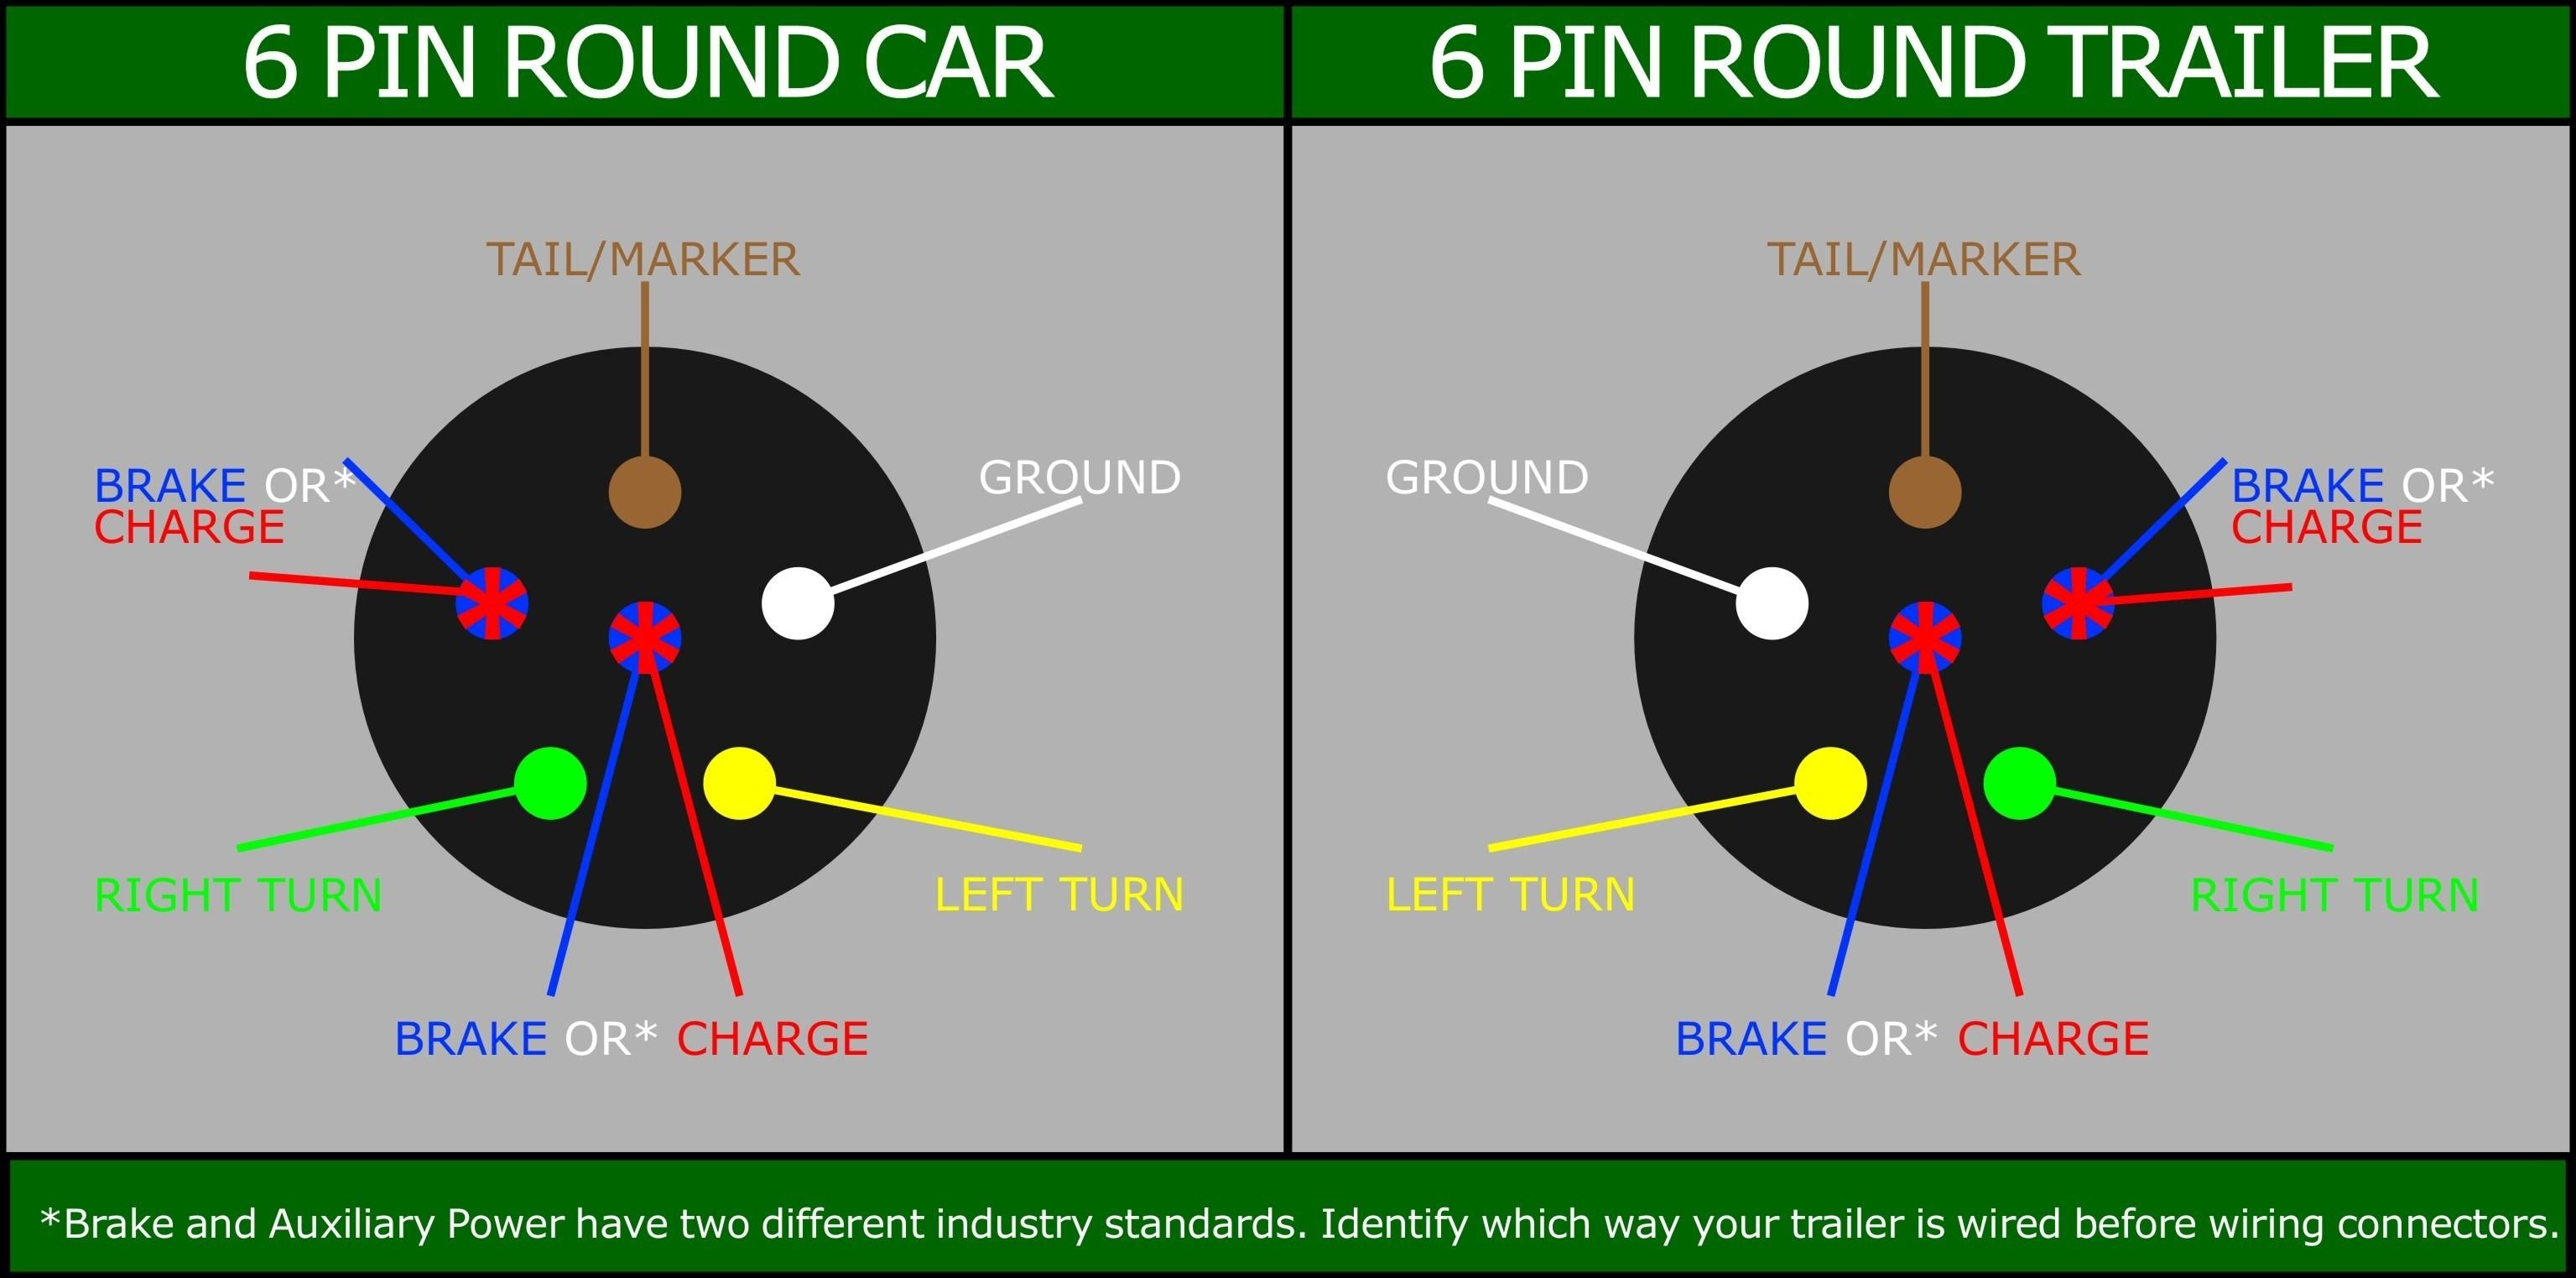 5 Pin Trailer Plug Wiring Diagram 6 Pin Trailer Plug Wiring Diagram Fitfathers Me Lovely Blurts Of 5 Pin Trailer Plug Wiring Diagram